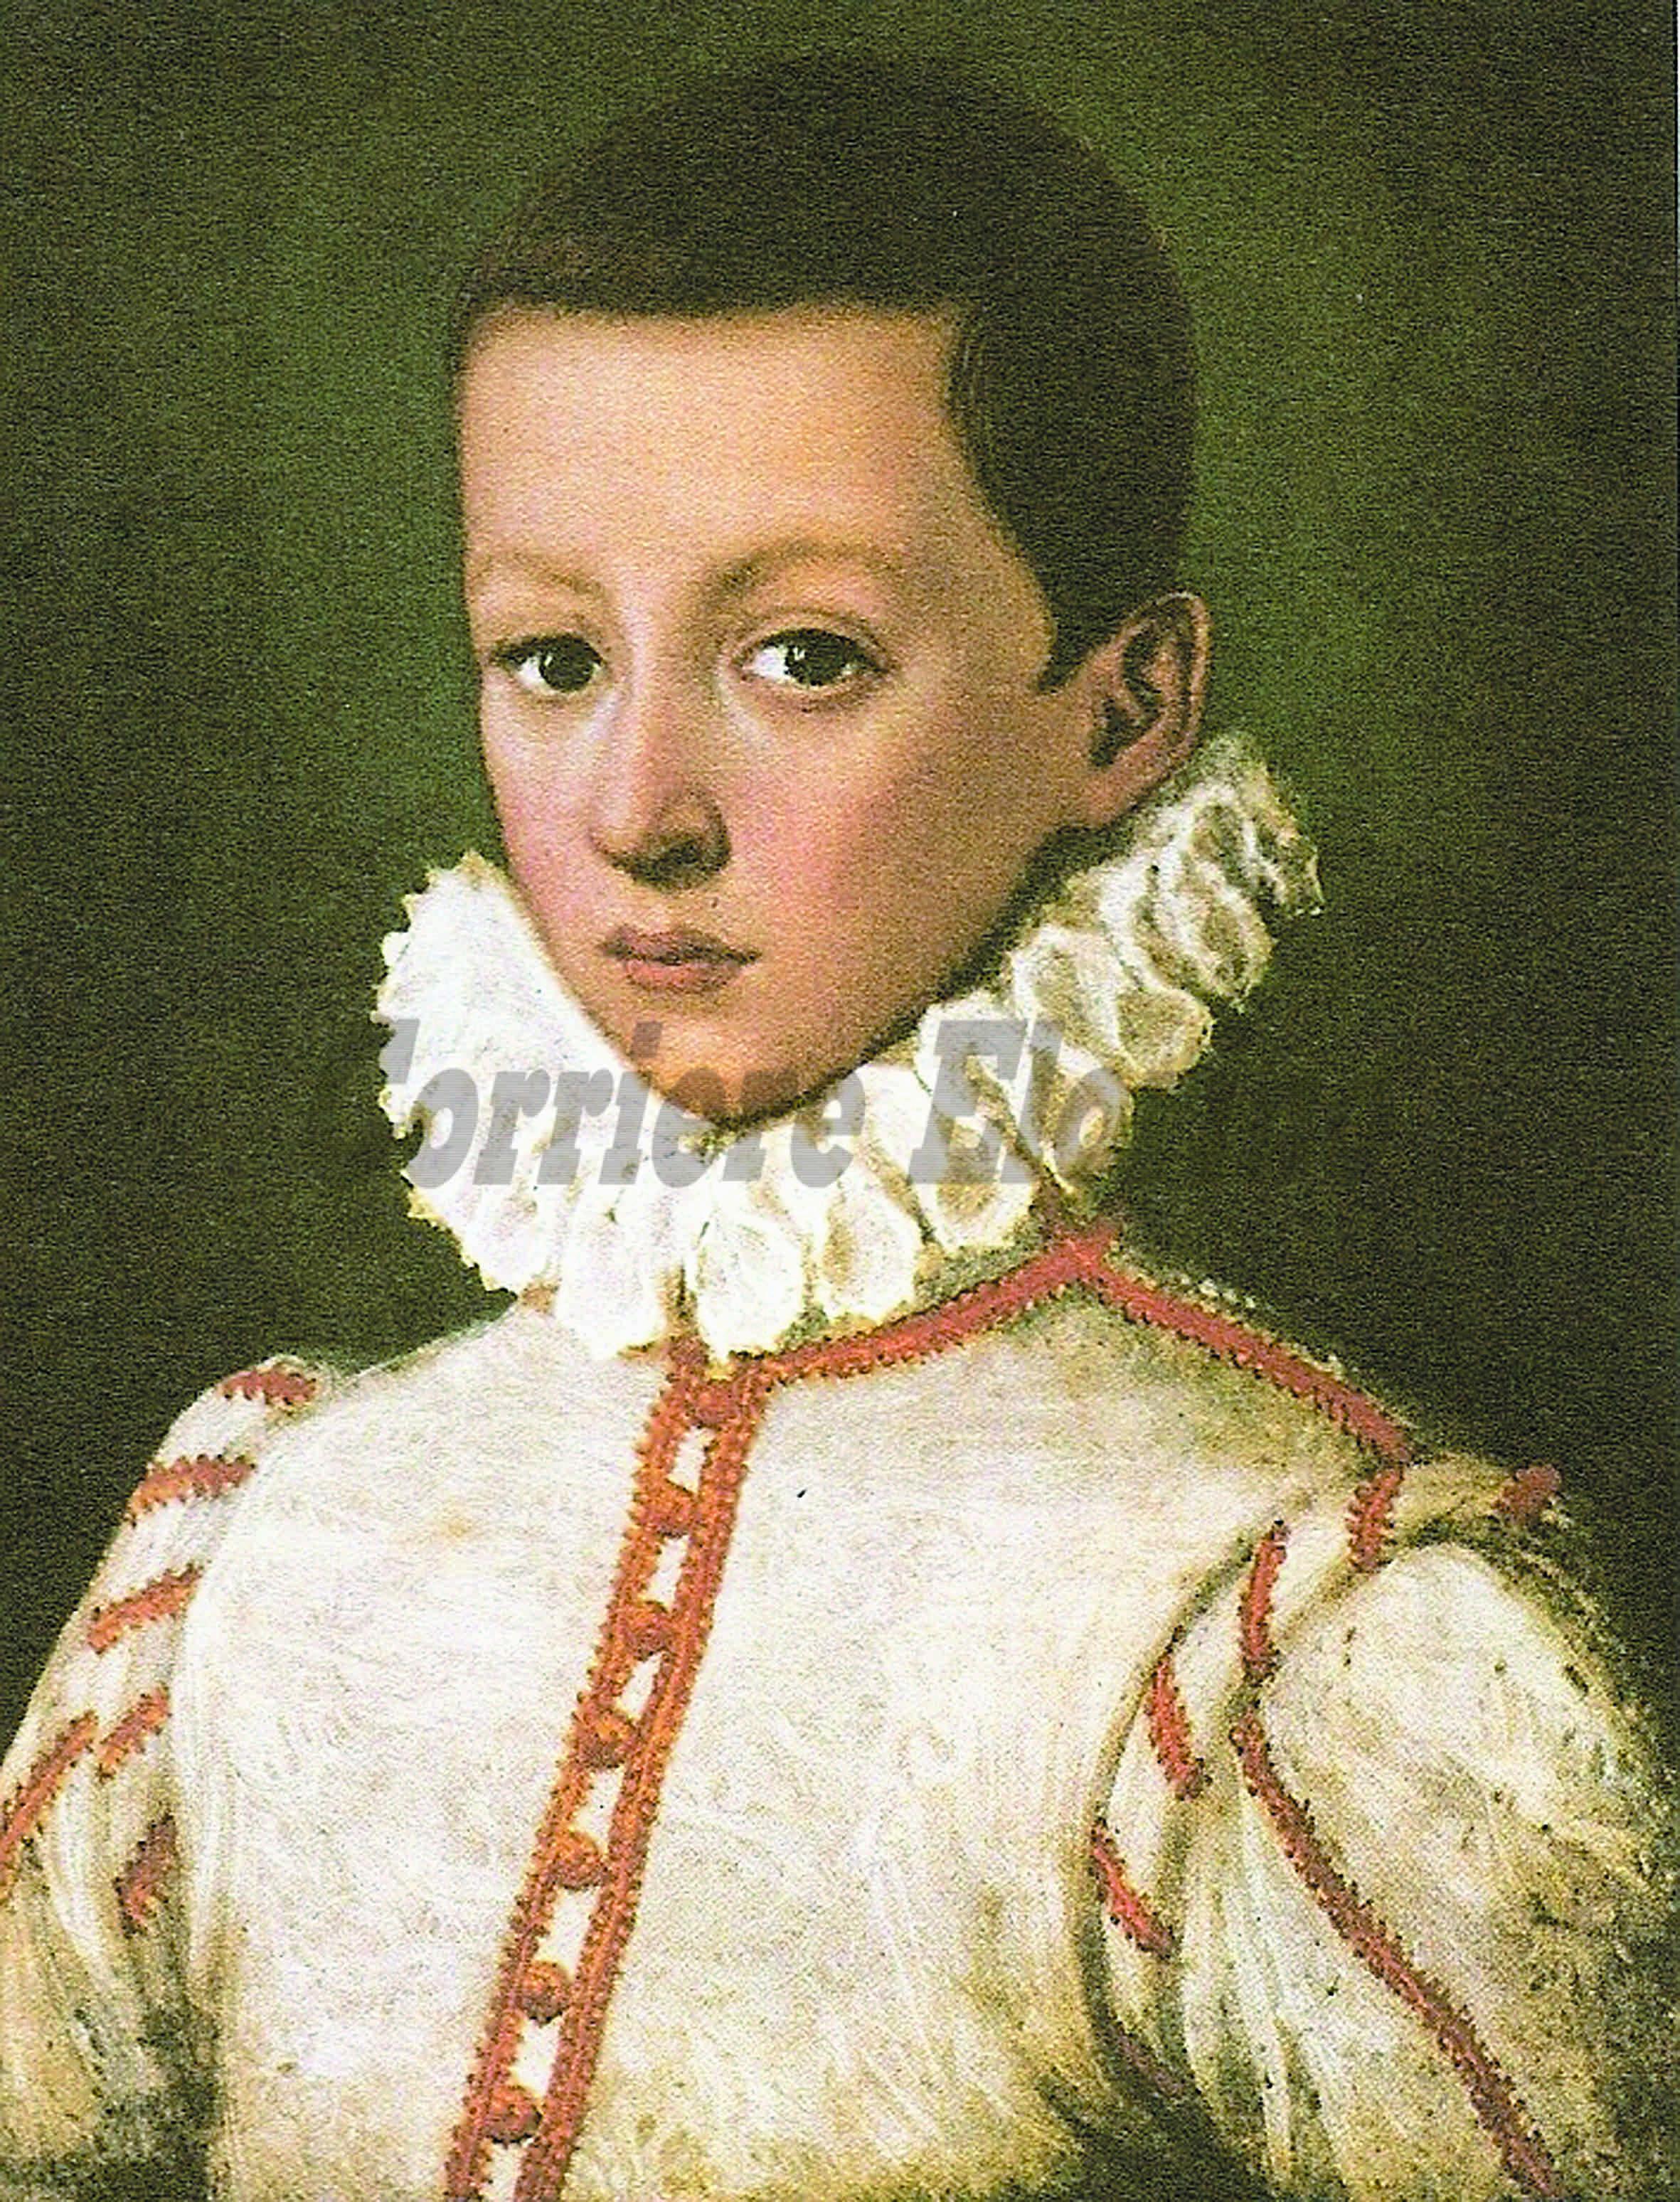 La storia di San Luigi Gonzaga a cura di Salvatore Spadaro